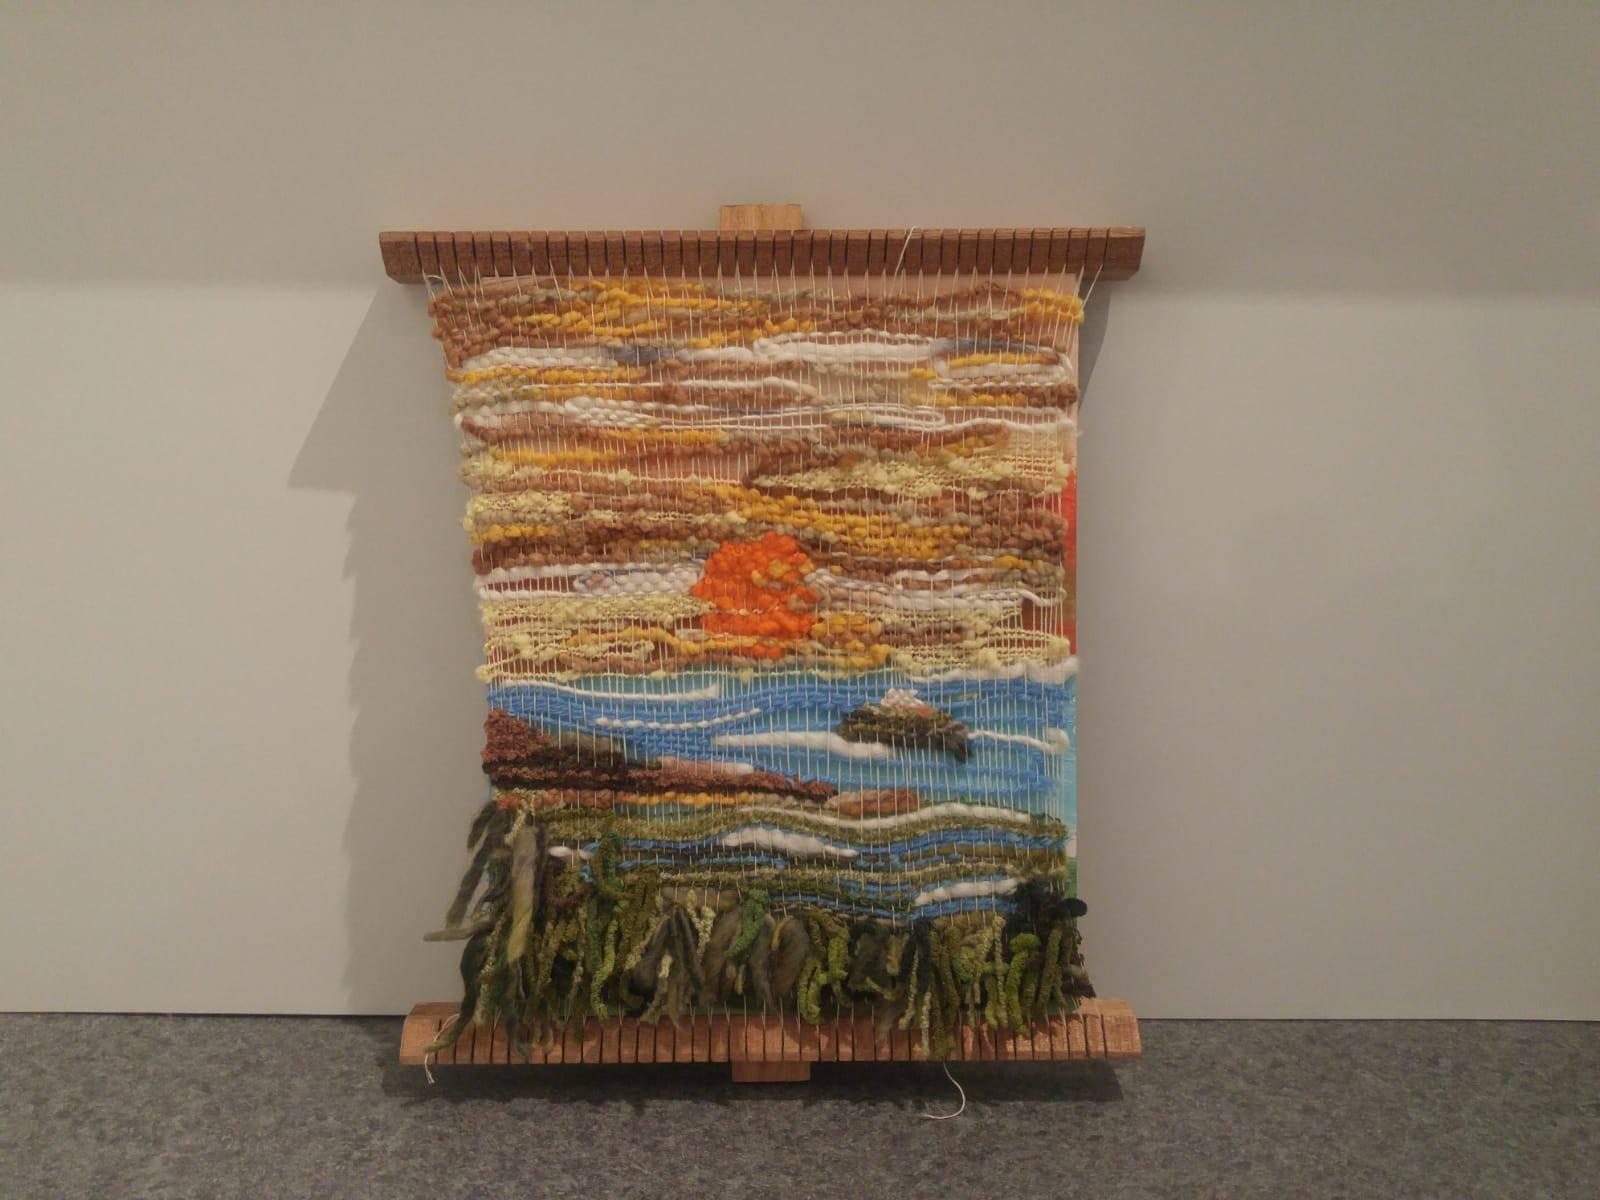 Free Weaving Workshop - K11 Art Infinity - K11